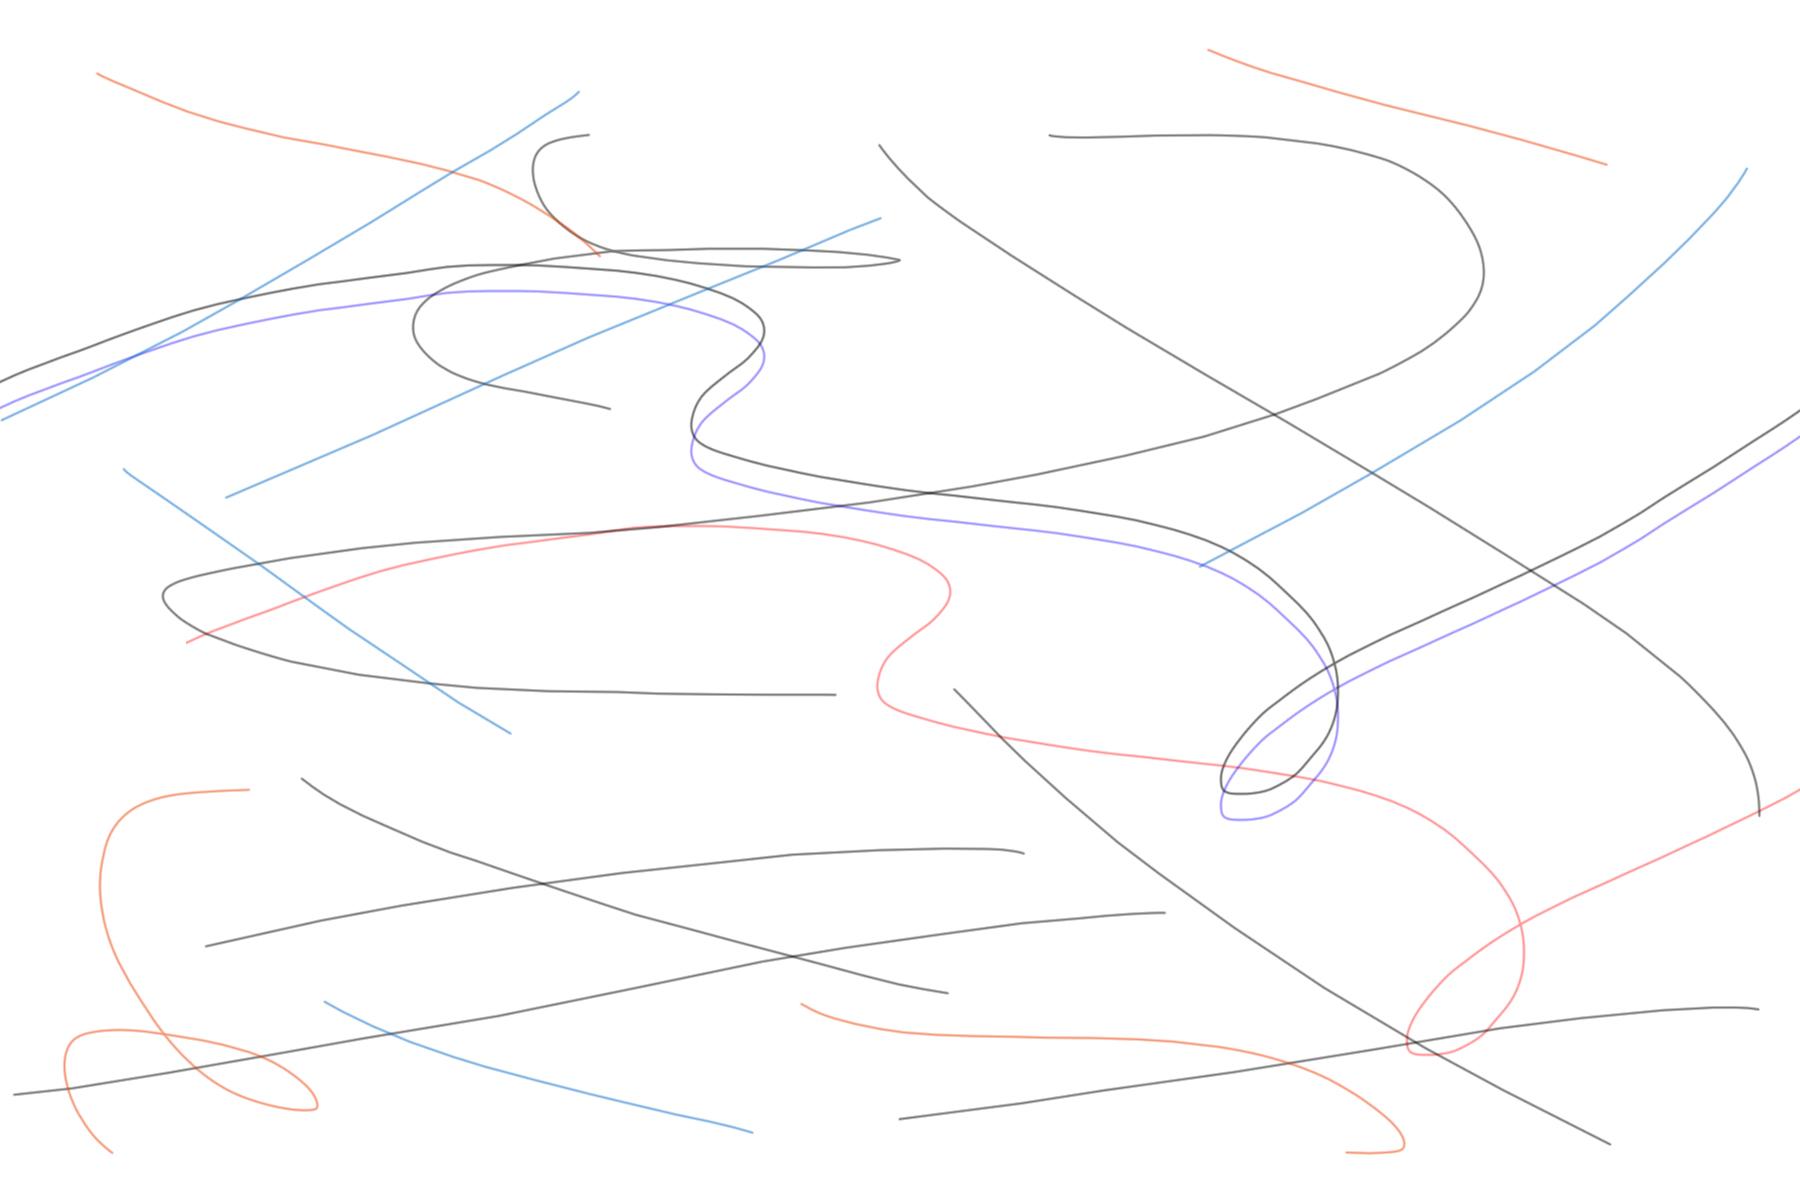 lignes courbes dessin